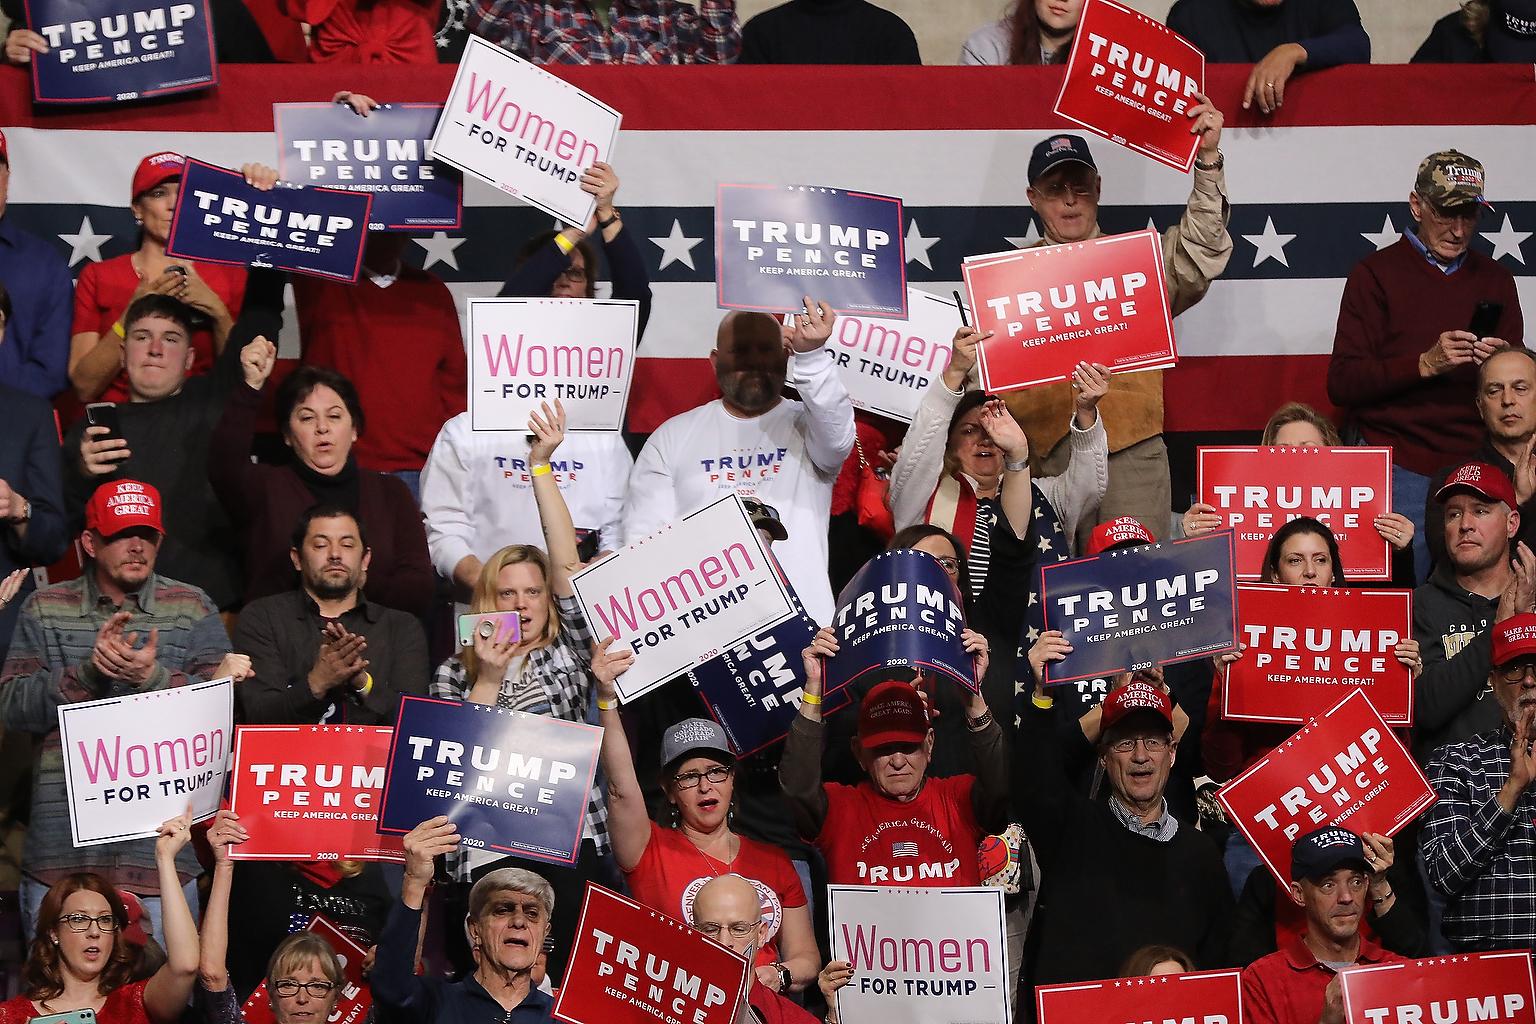 Trump Rally Crowd